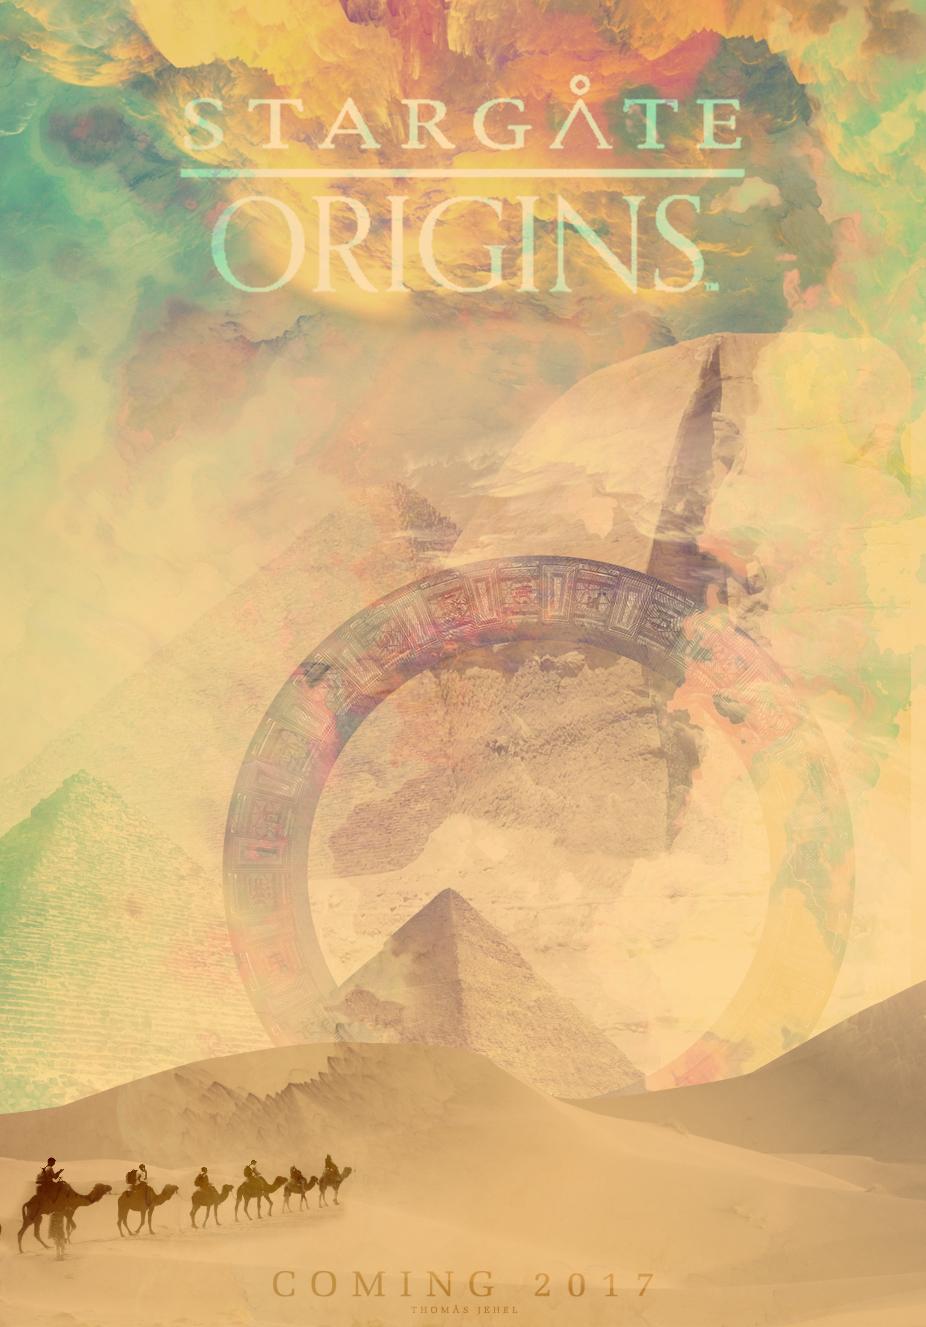 stargate origins stargate poster SGA sgu pyramid desert Serie